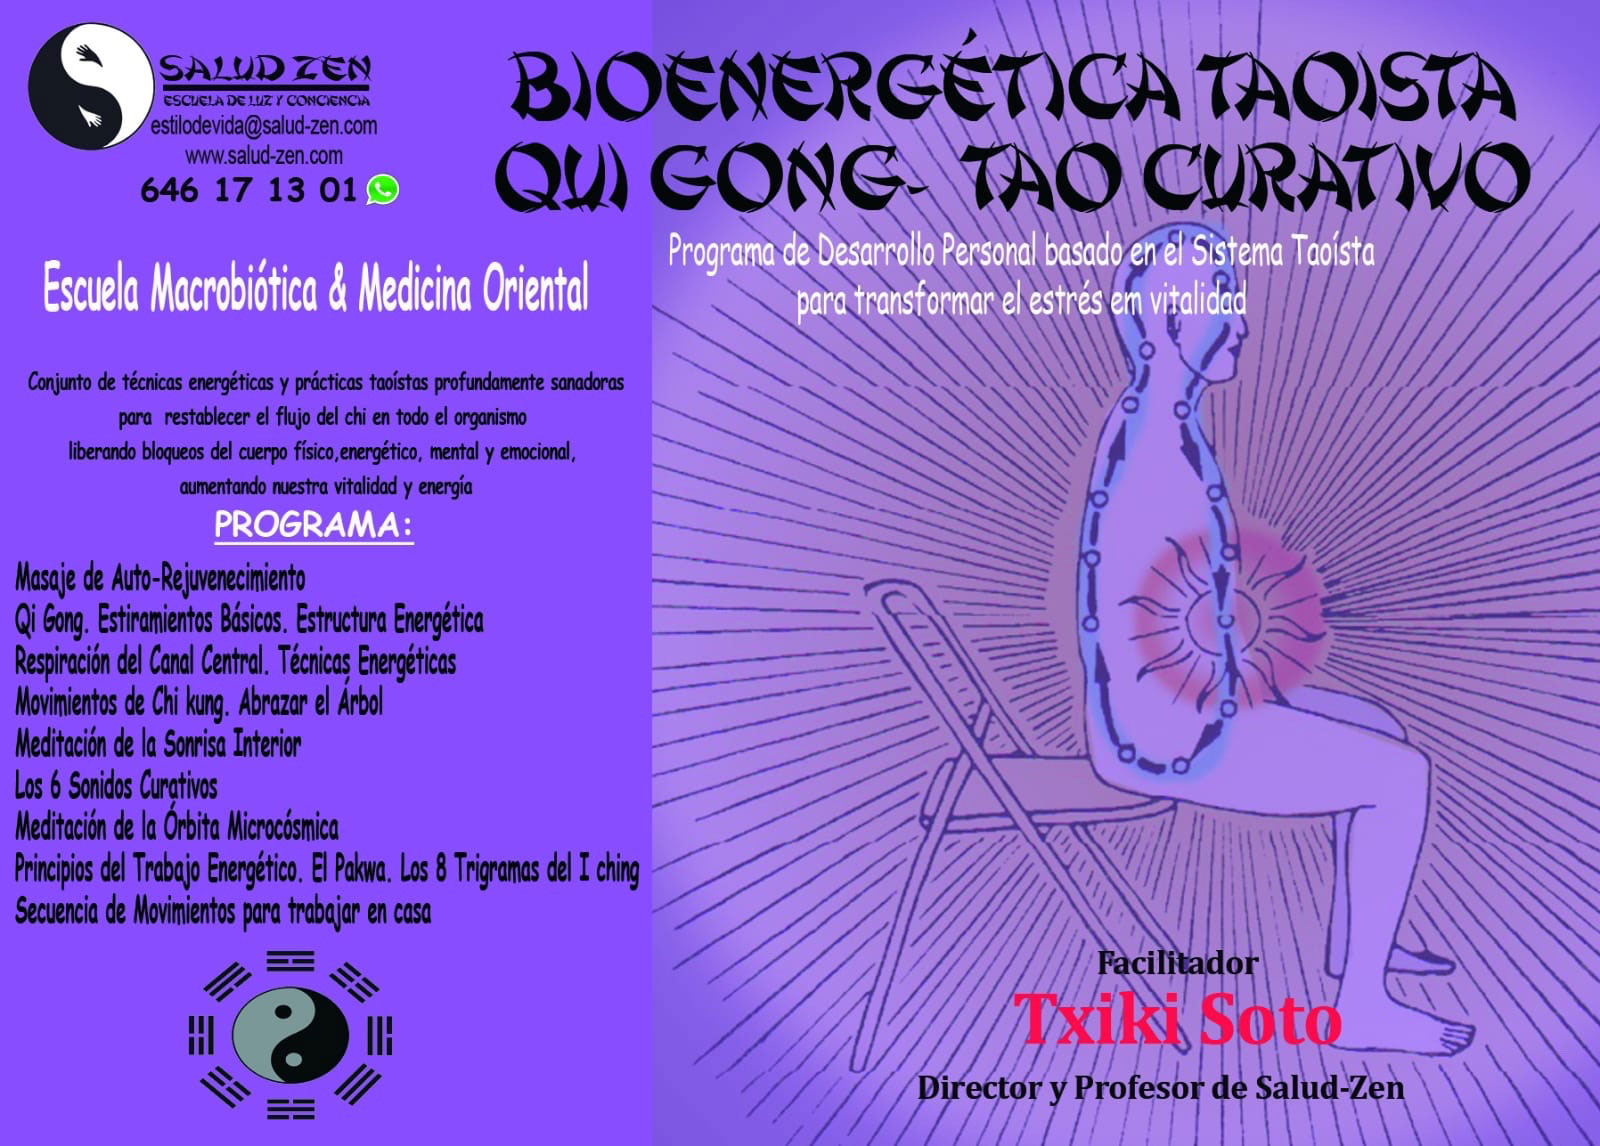 Programa de Desarrollo Personal basado en el Sistema Taoista para transformar el estrés en vitalidad. Bioenergética. Taoísta. Qui-Gong - Tao Curativo